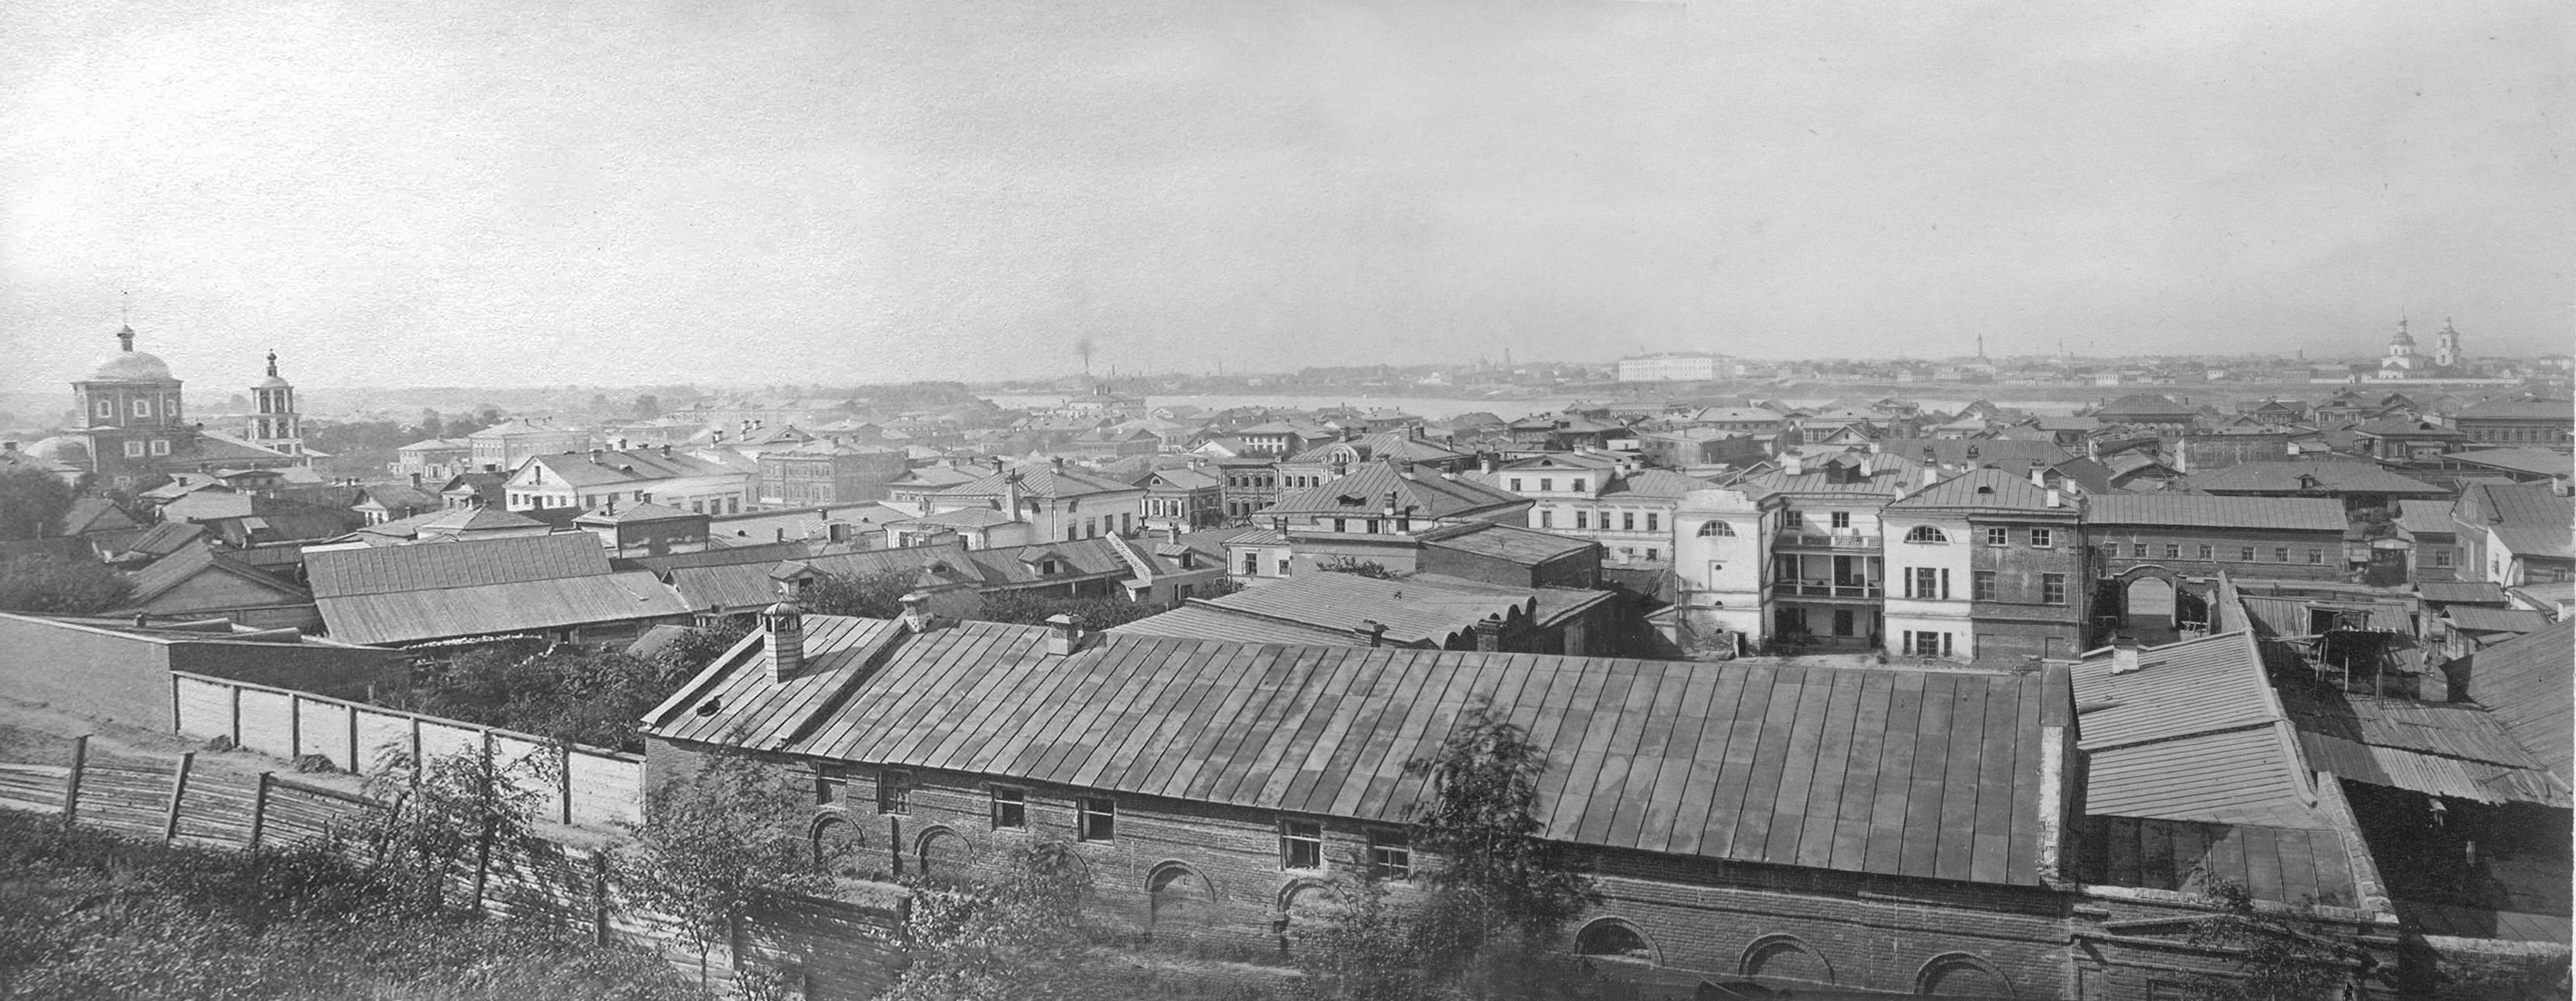 1879. Вид на Суконную слободу.